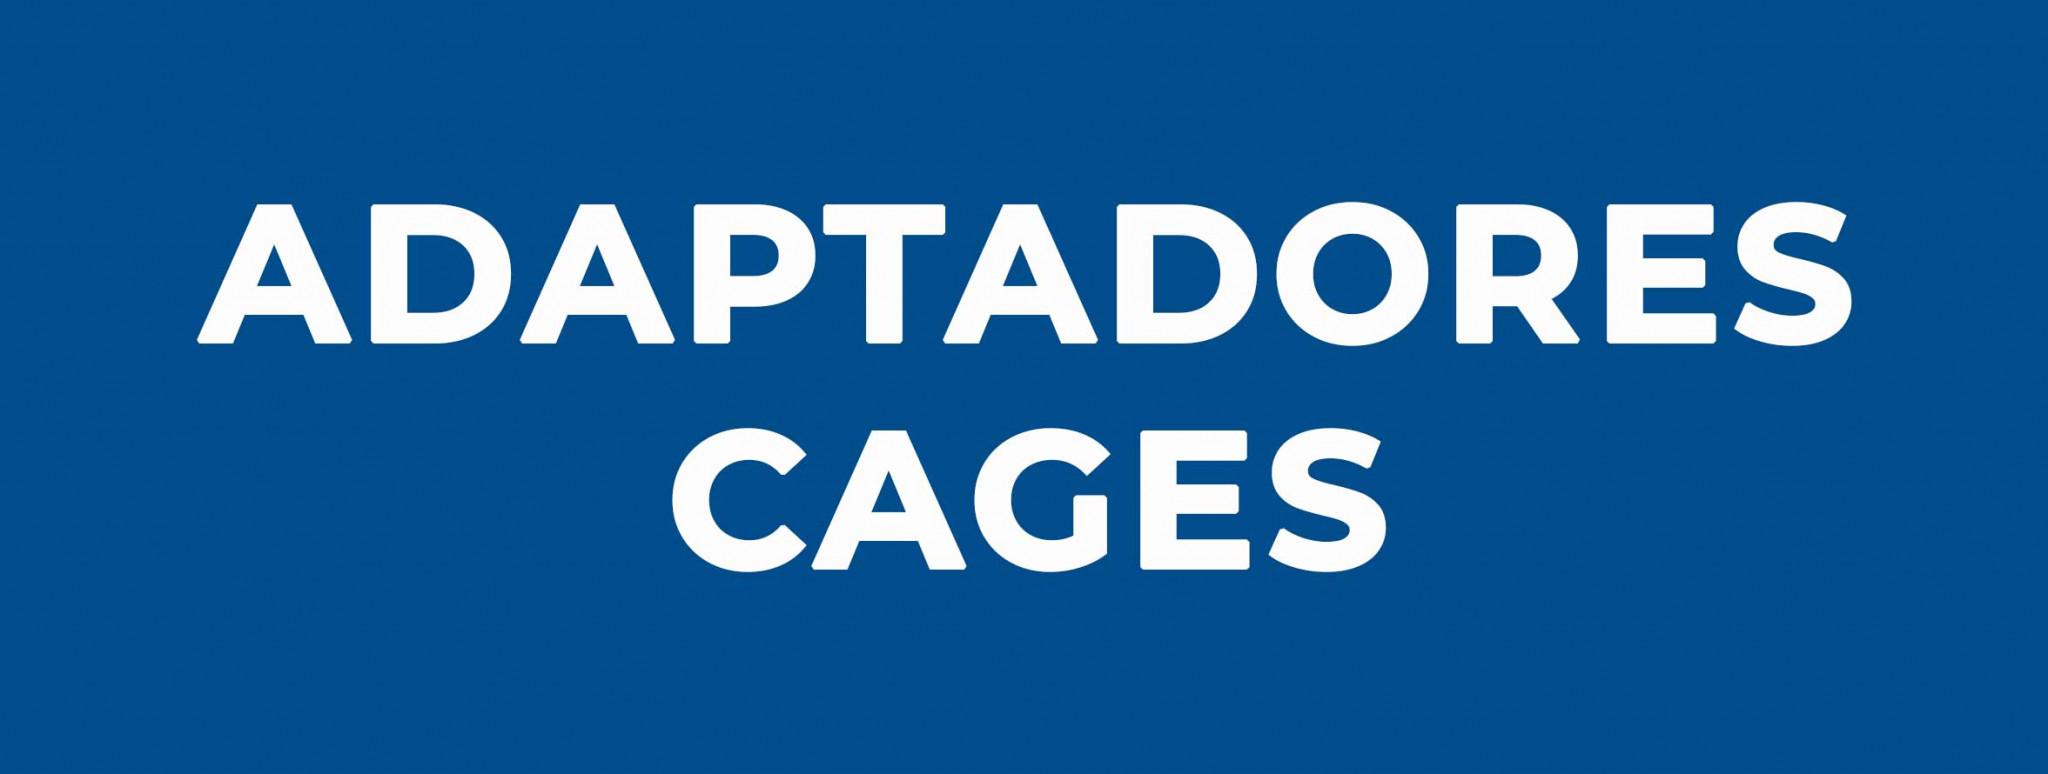 Adaptadores Cages